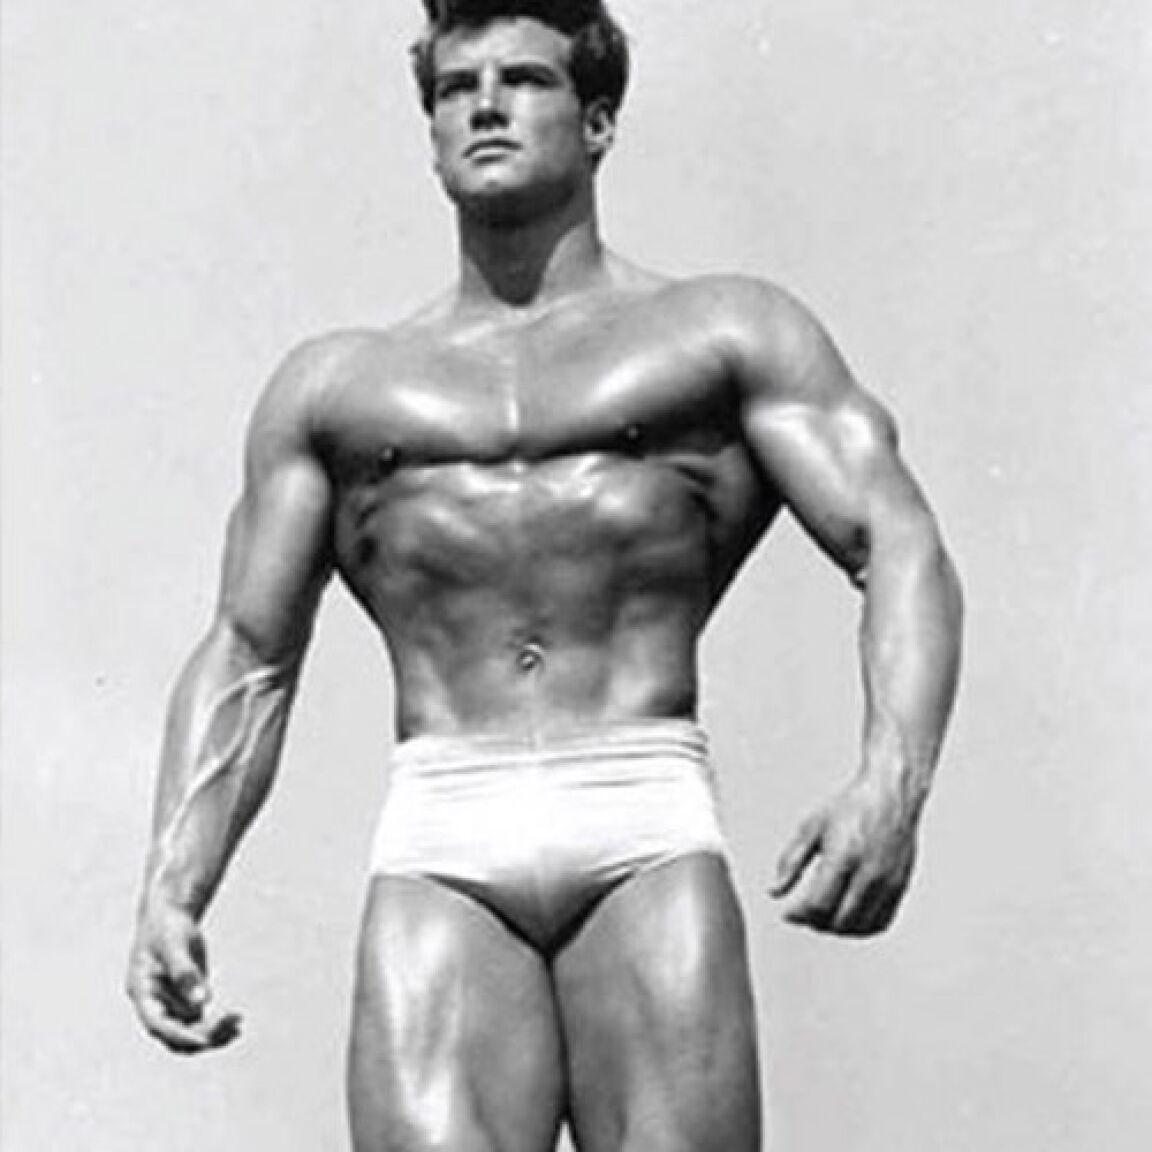 Muskelaufbau Trainingsfrequenz